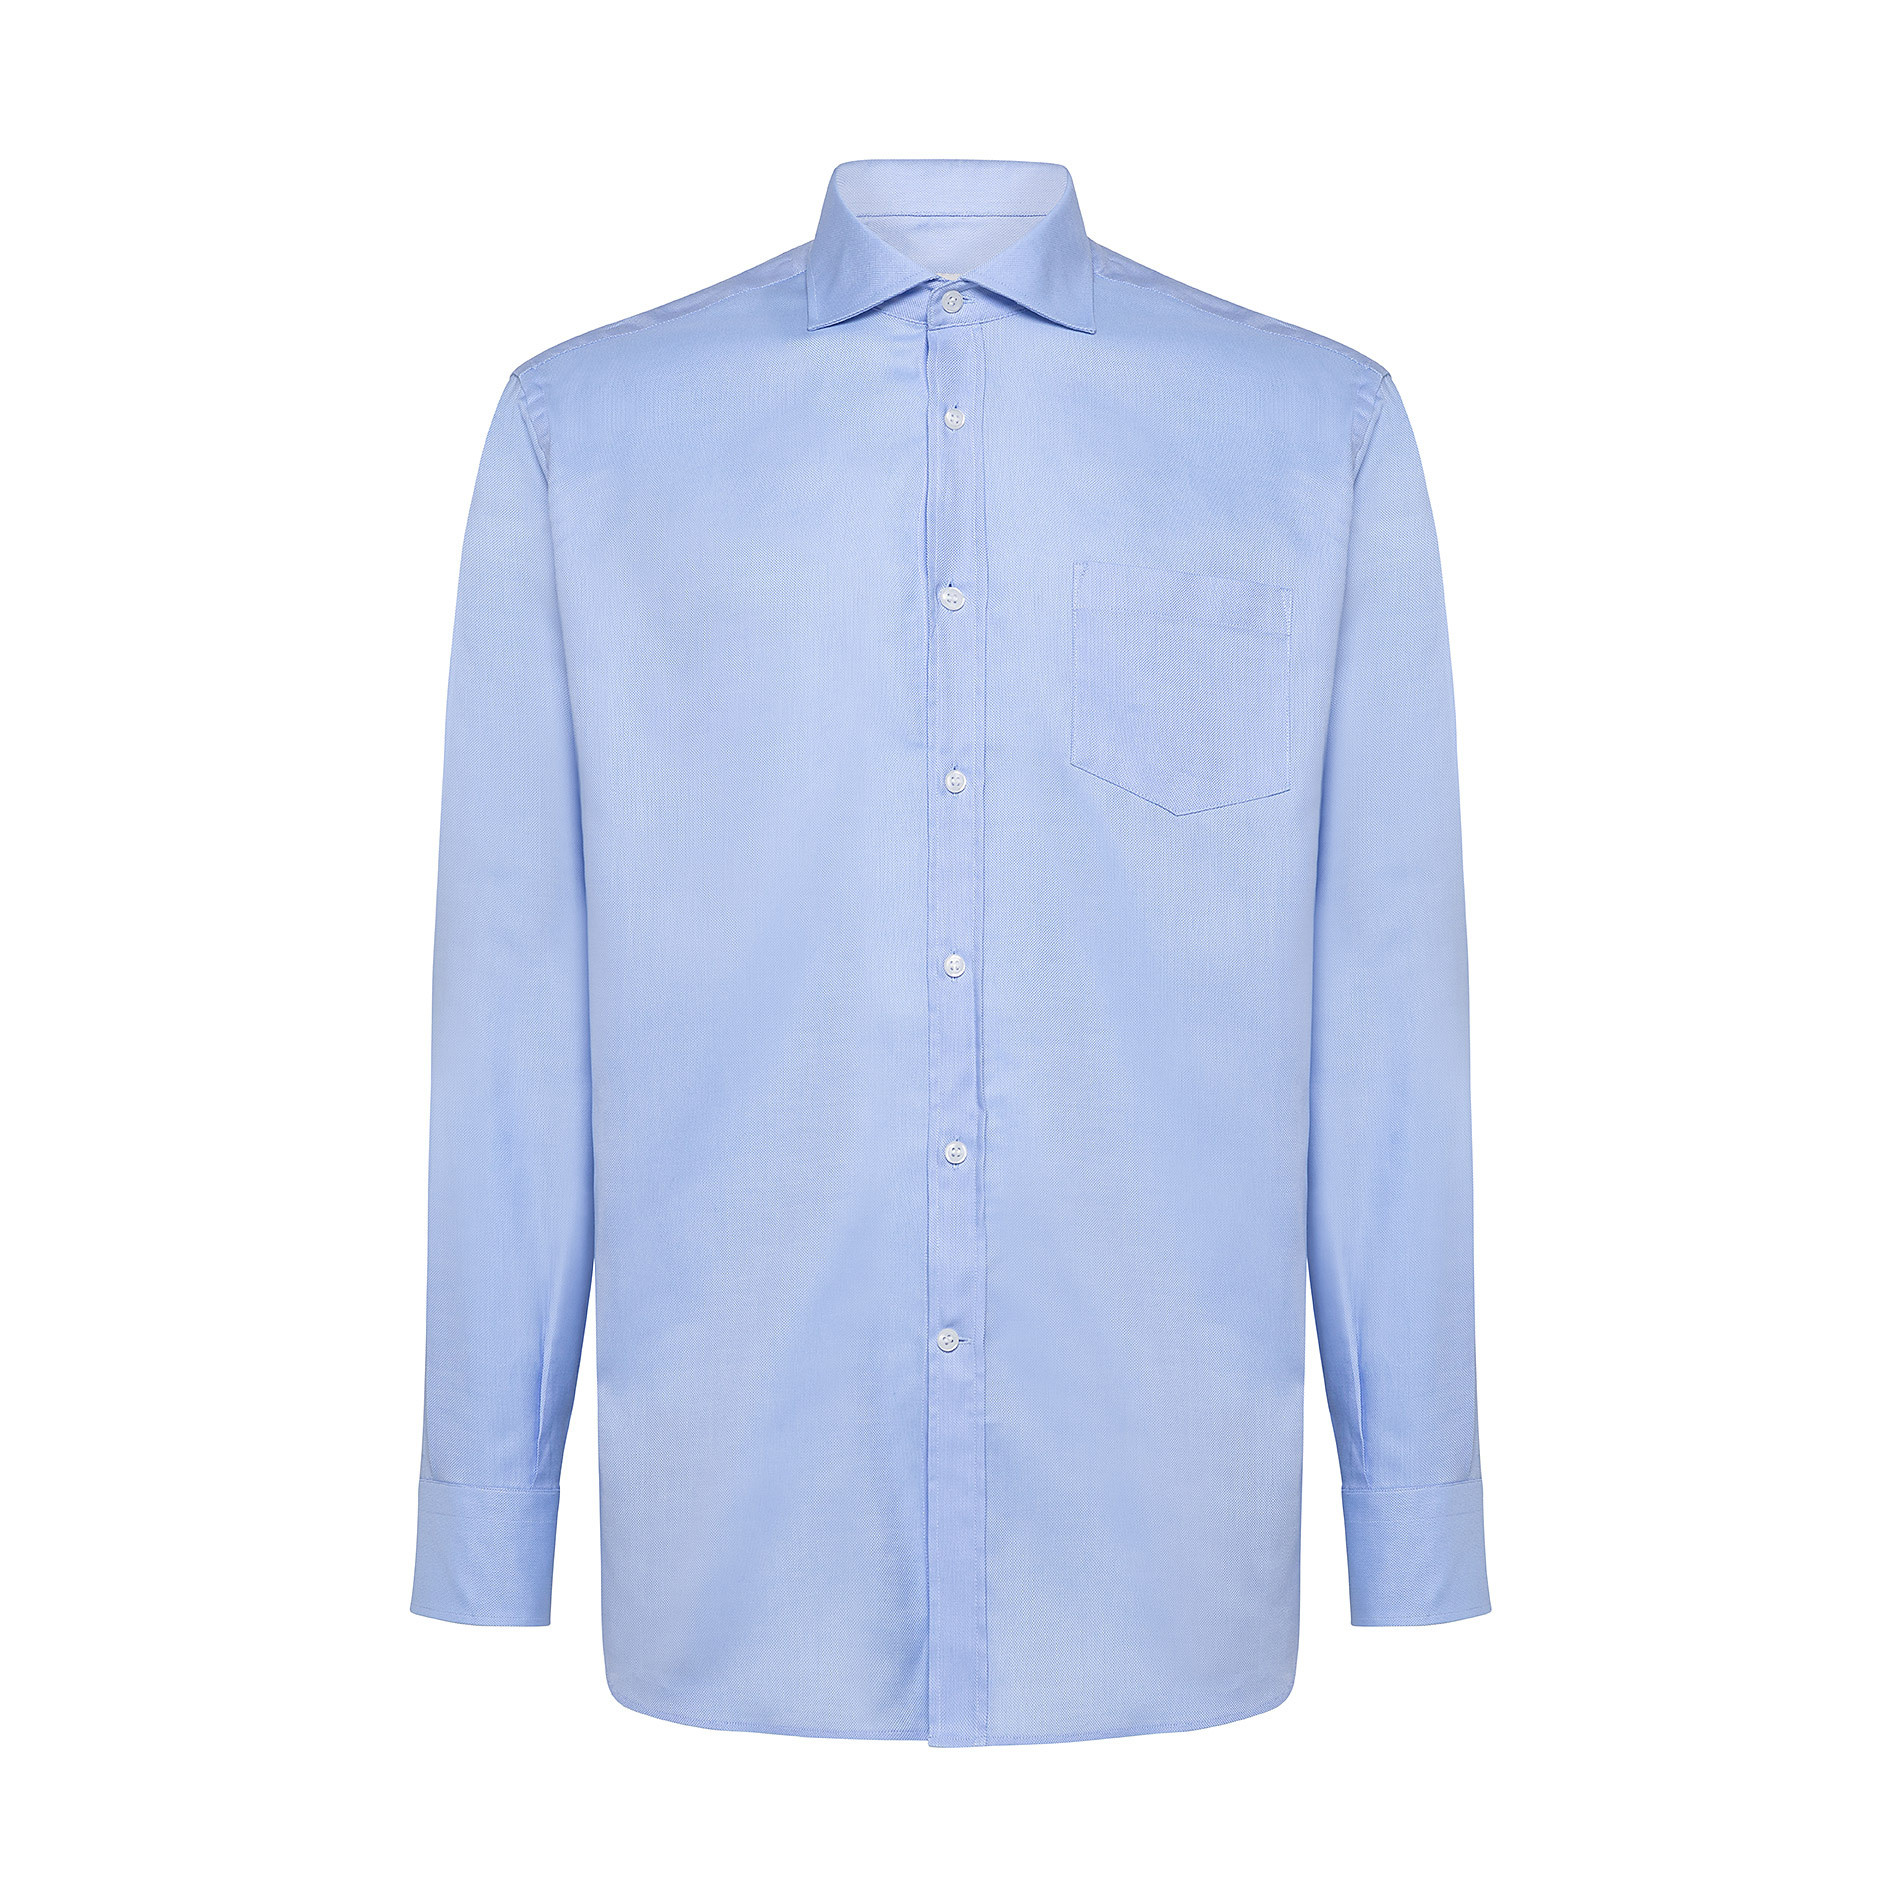 Camicia colletto francese in cotone, Azzurro, large image number 0